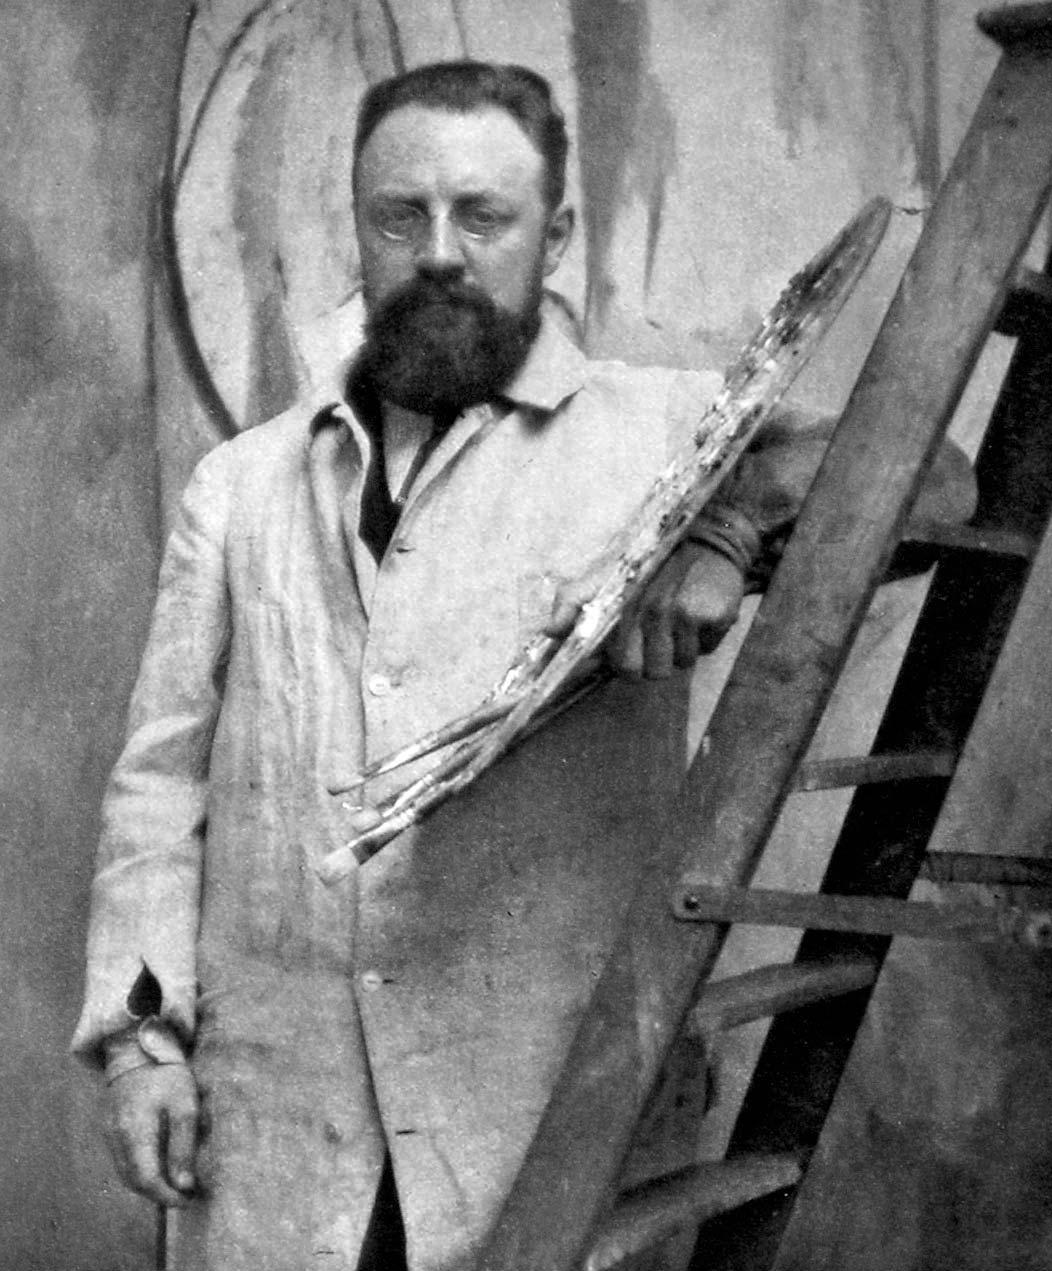 Henri-Matisse-photograph-Alvin-Langdon-Coburn-1913